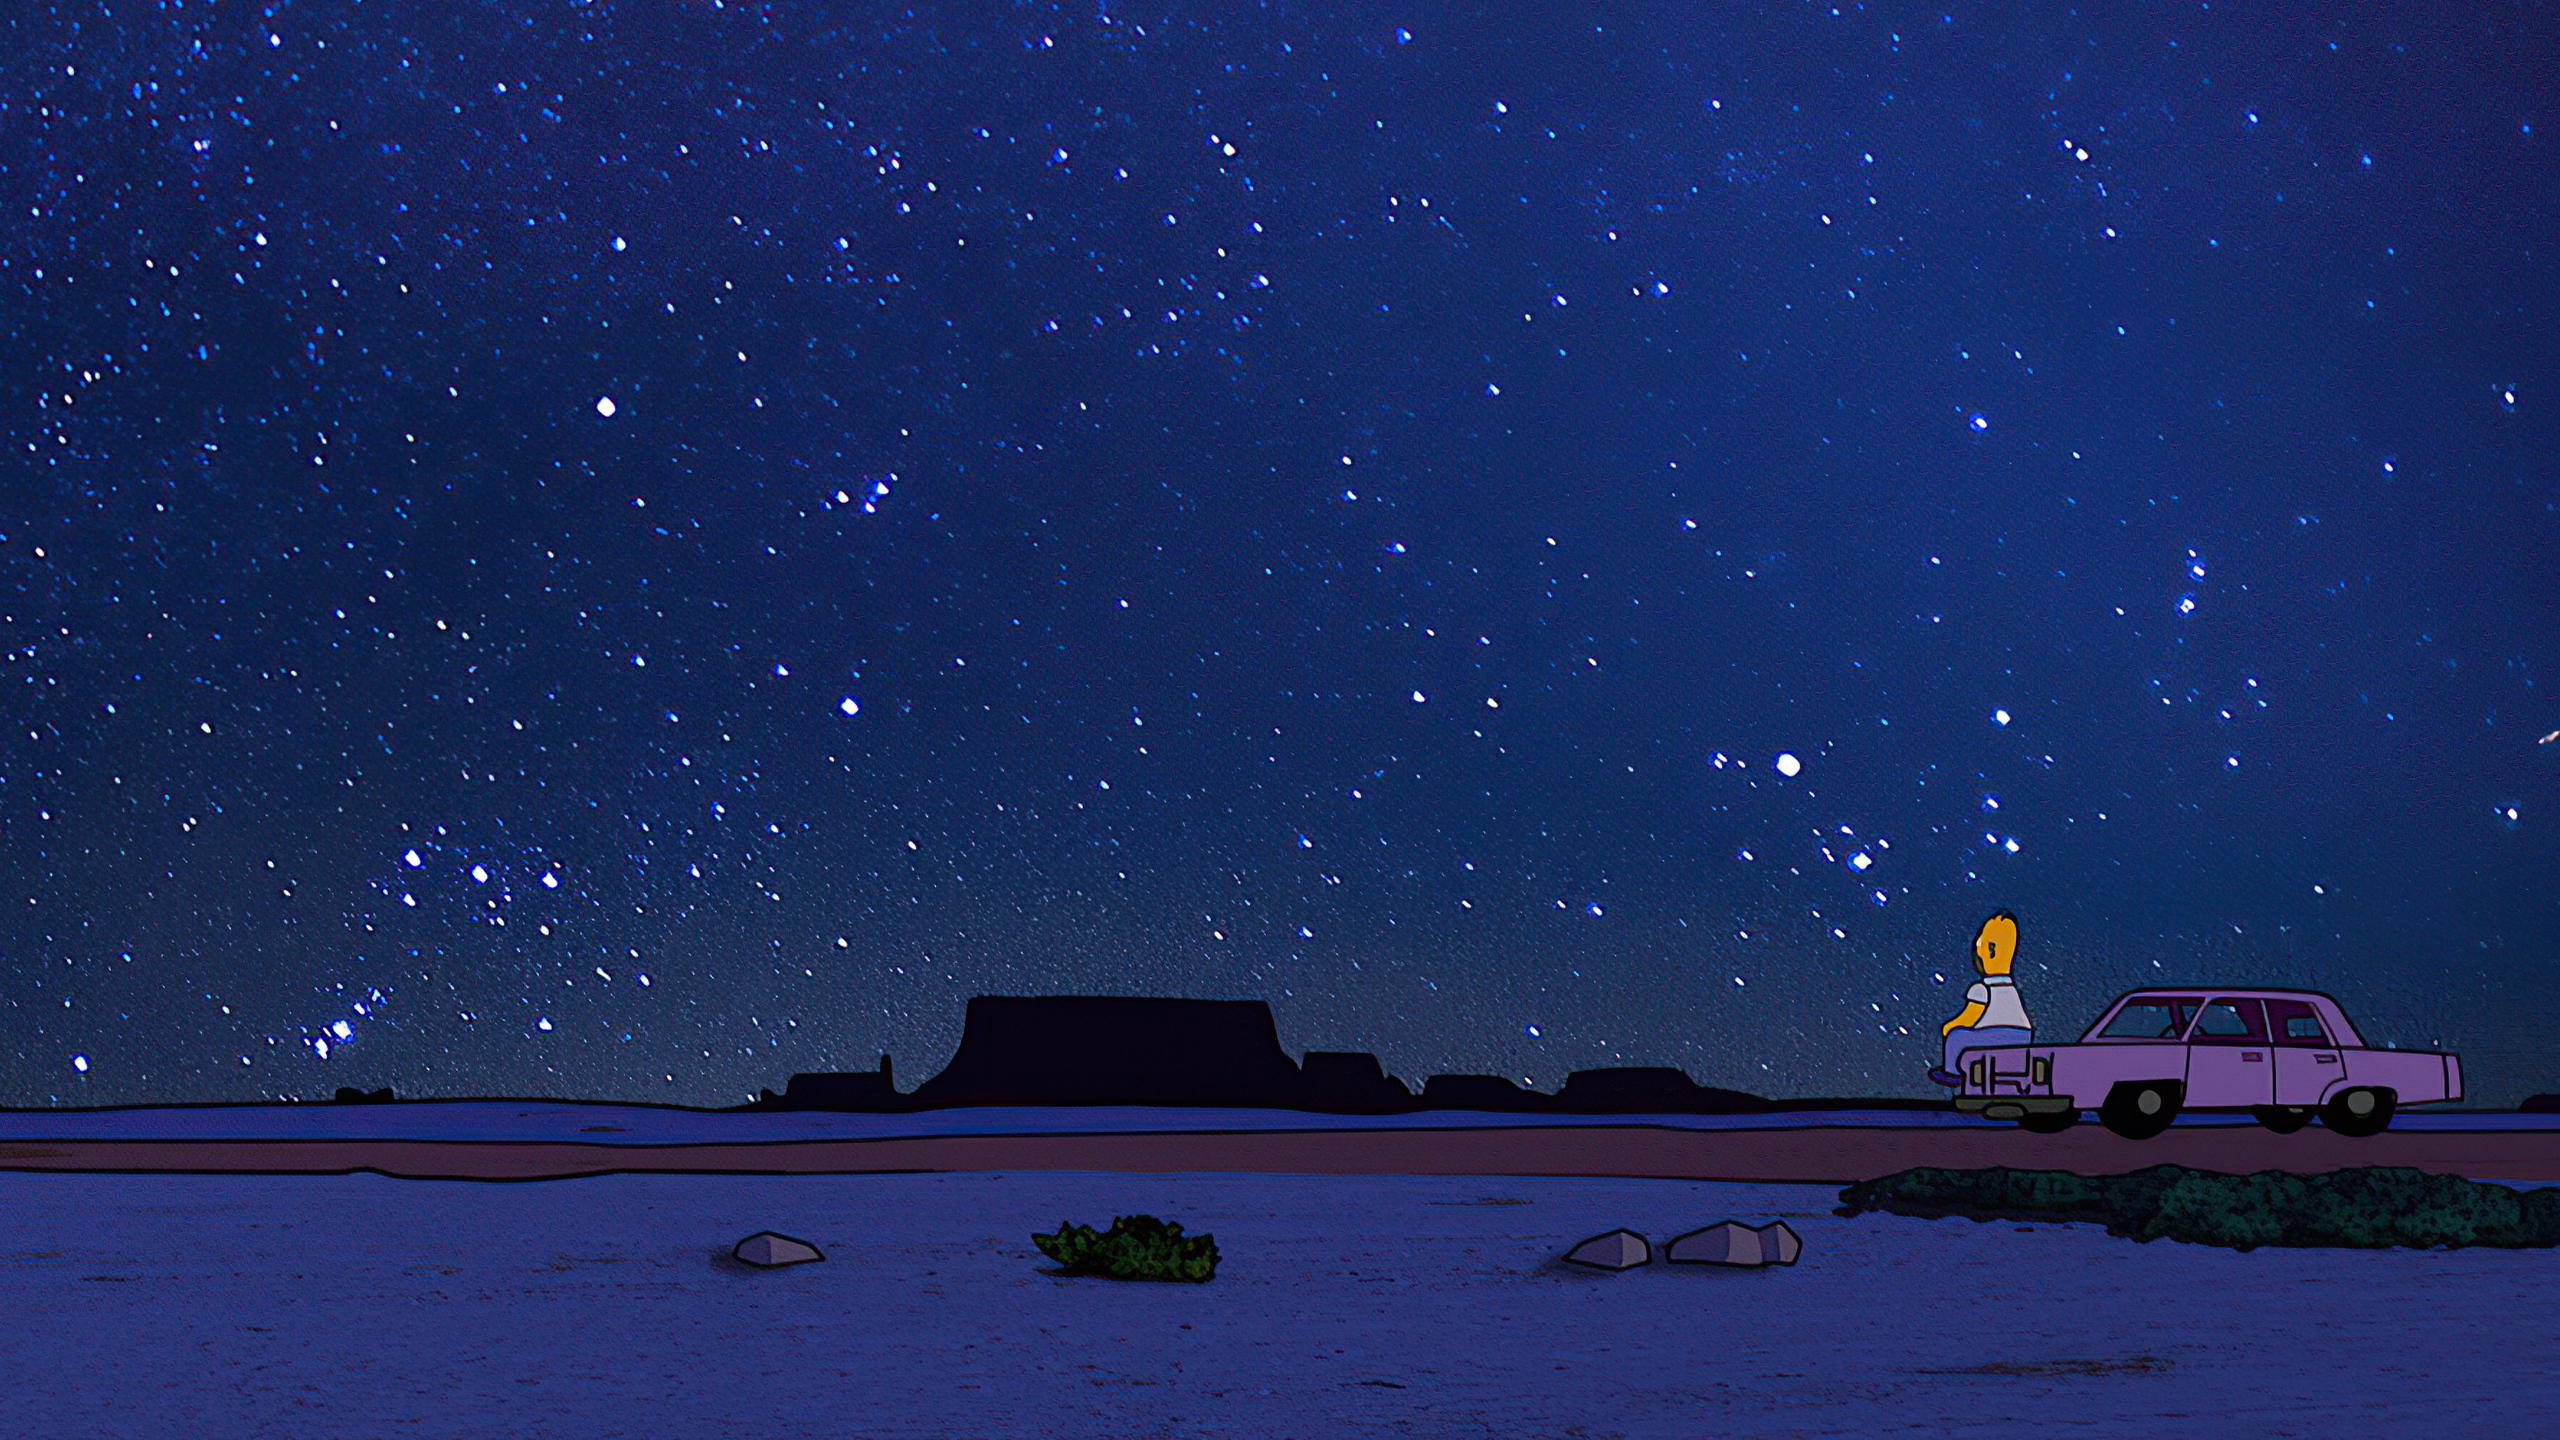 homer-simpson-alone-life-4k-c0.jpg